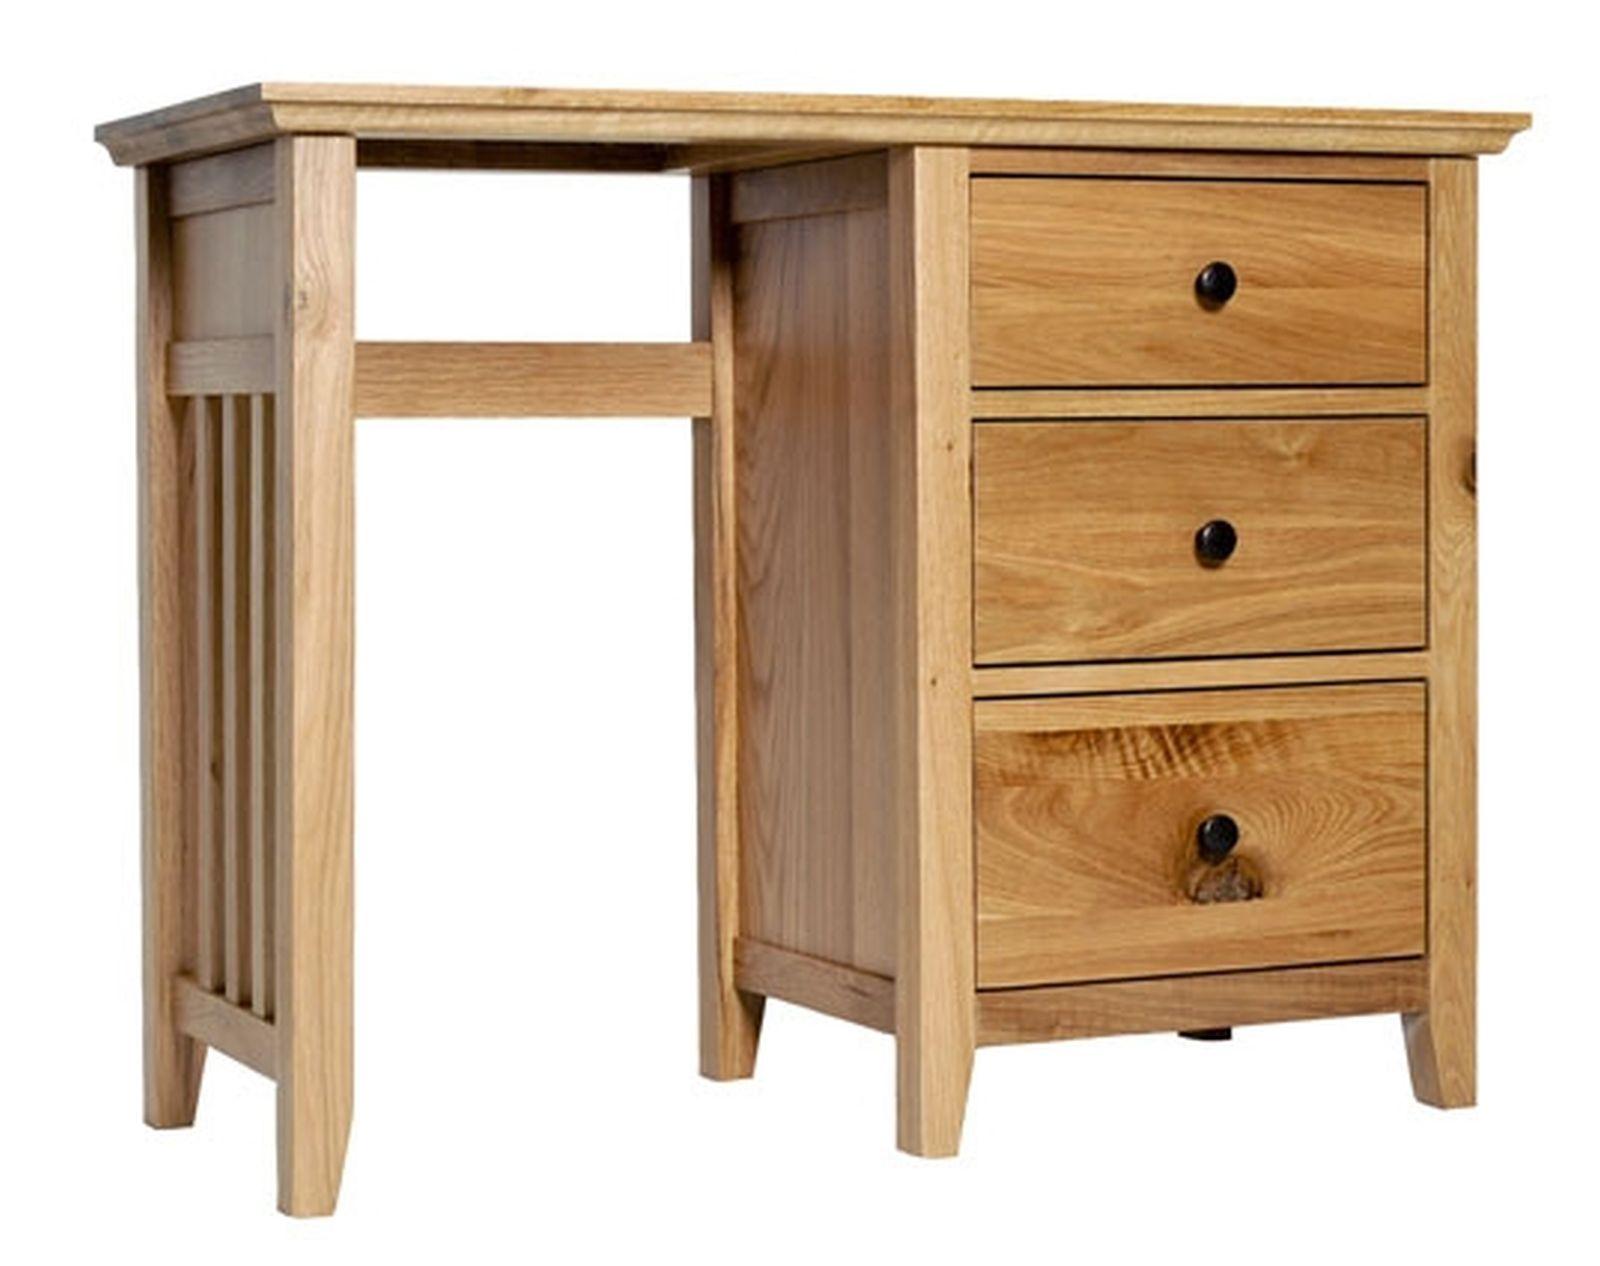 Allerton solid oak bedroom furniture small dressing table for Small dressing table